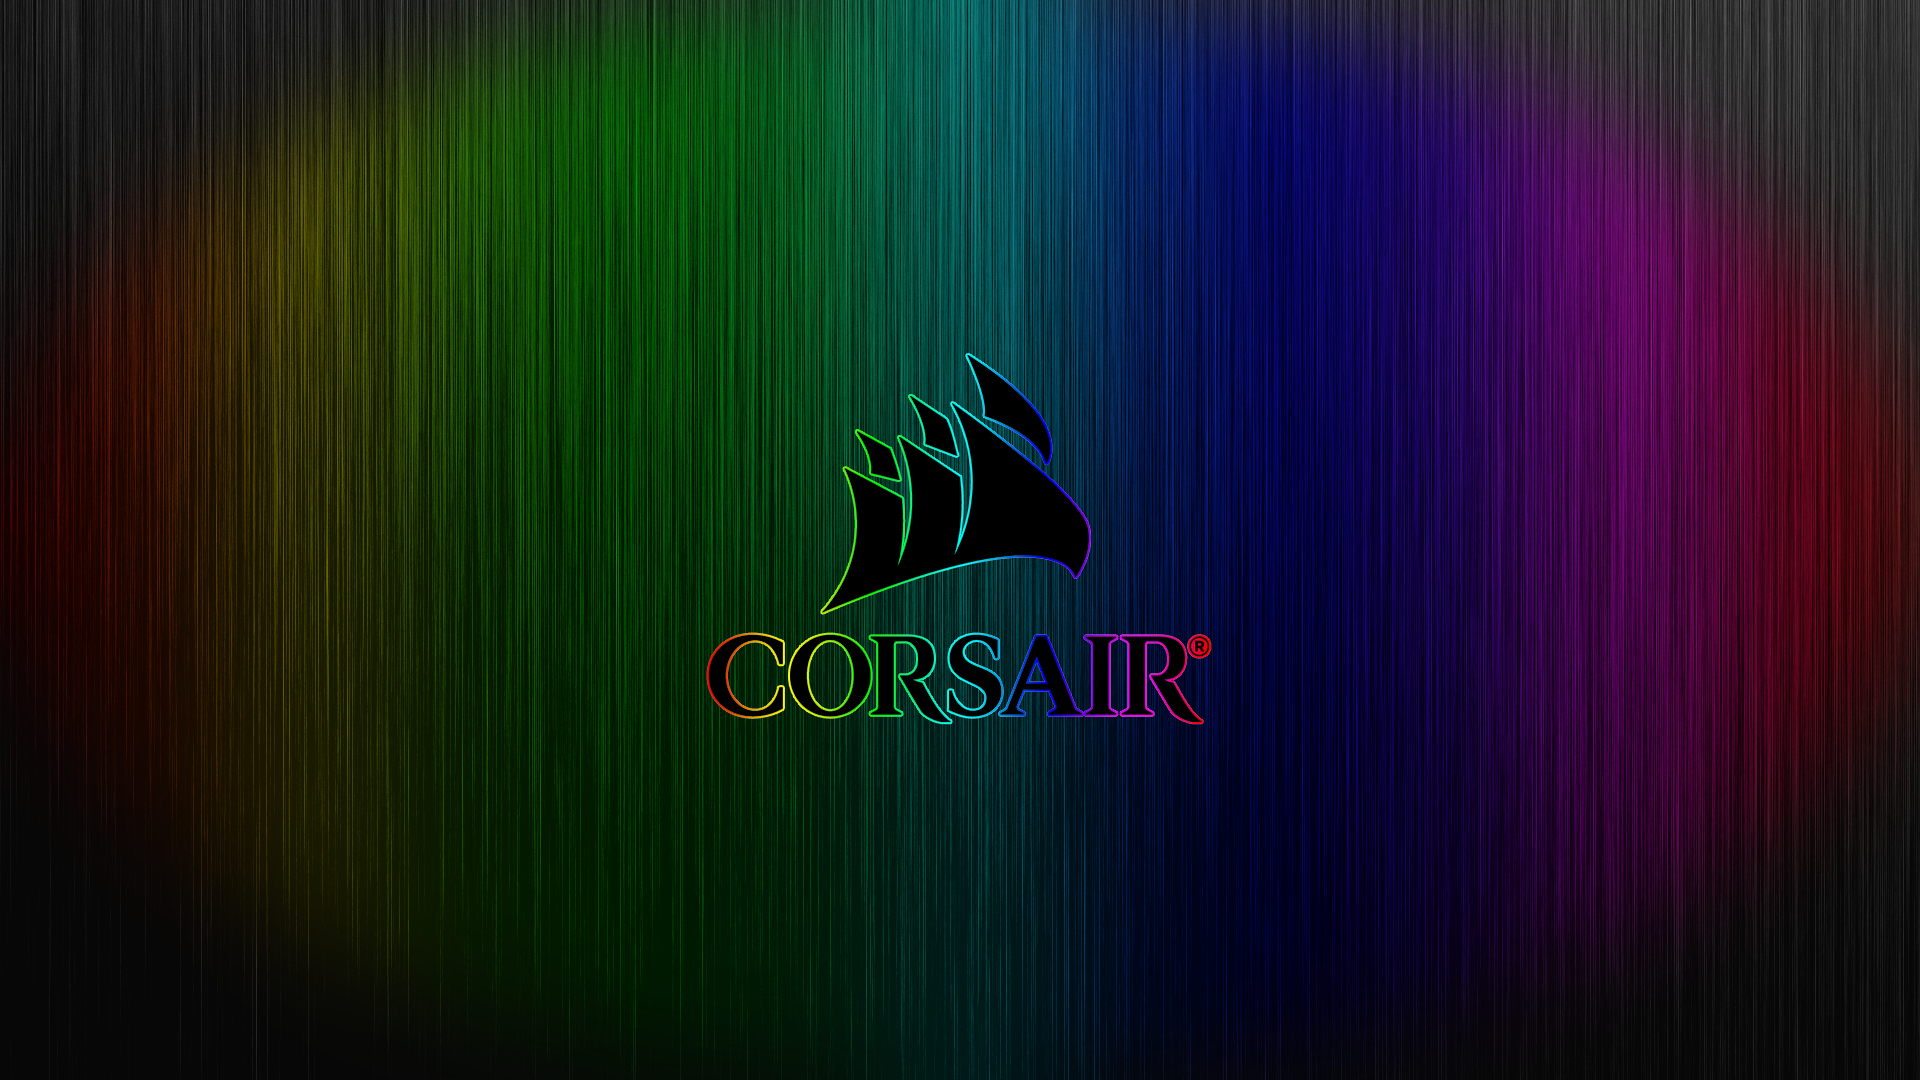 Corsair Computer Wallpapers Top Free Corsair Computer Backgrounds Wallpaperaccess